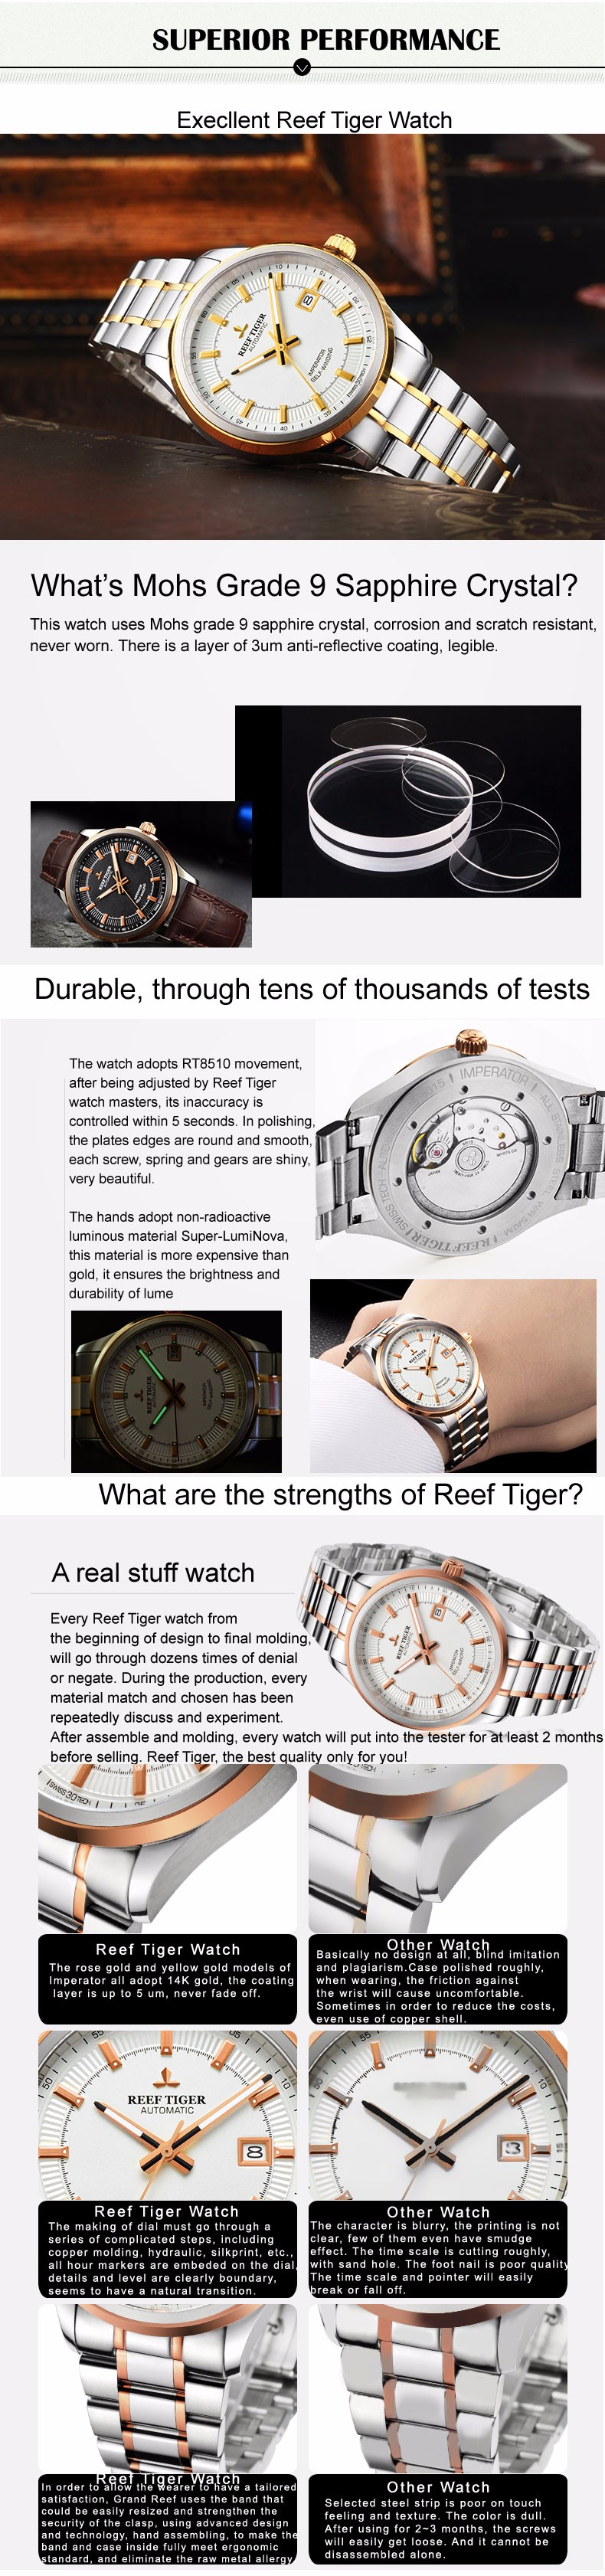 Reef tiger rt negócios masculino classe superior